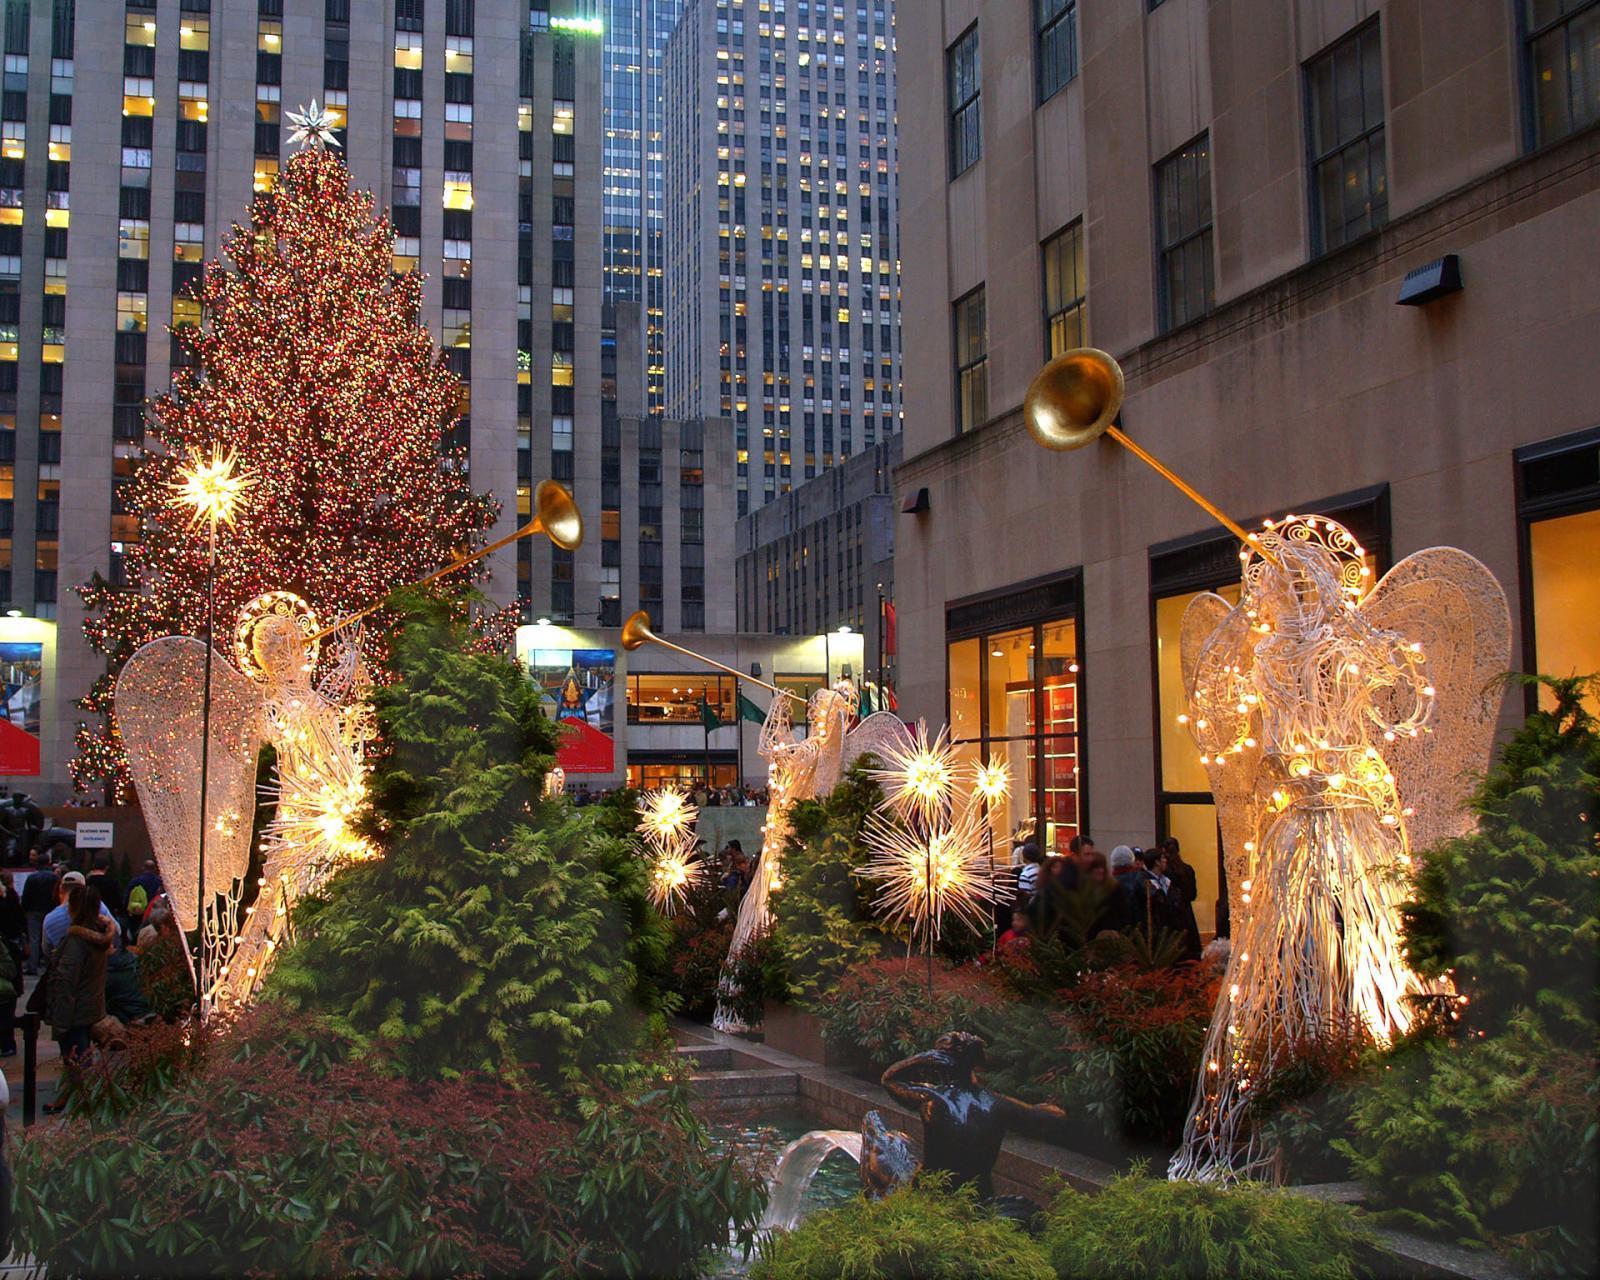 Top 7 New York Christmas Tours | Loving New York